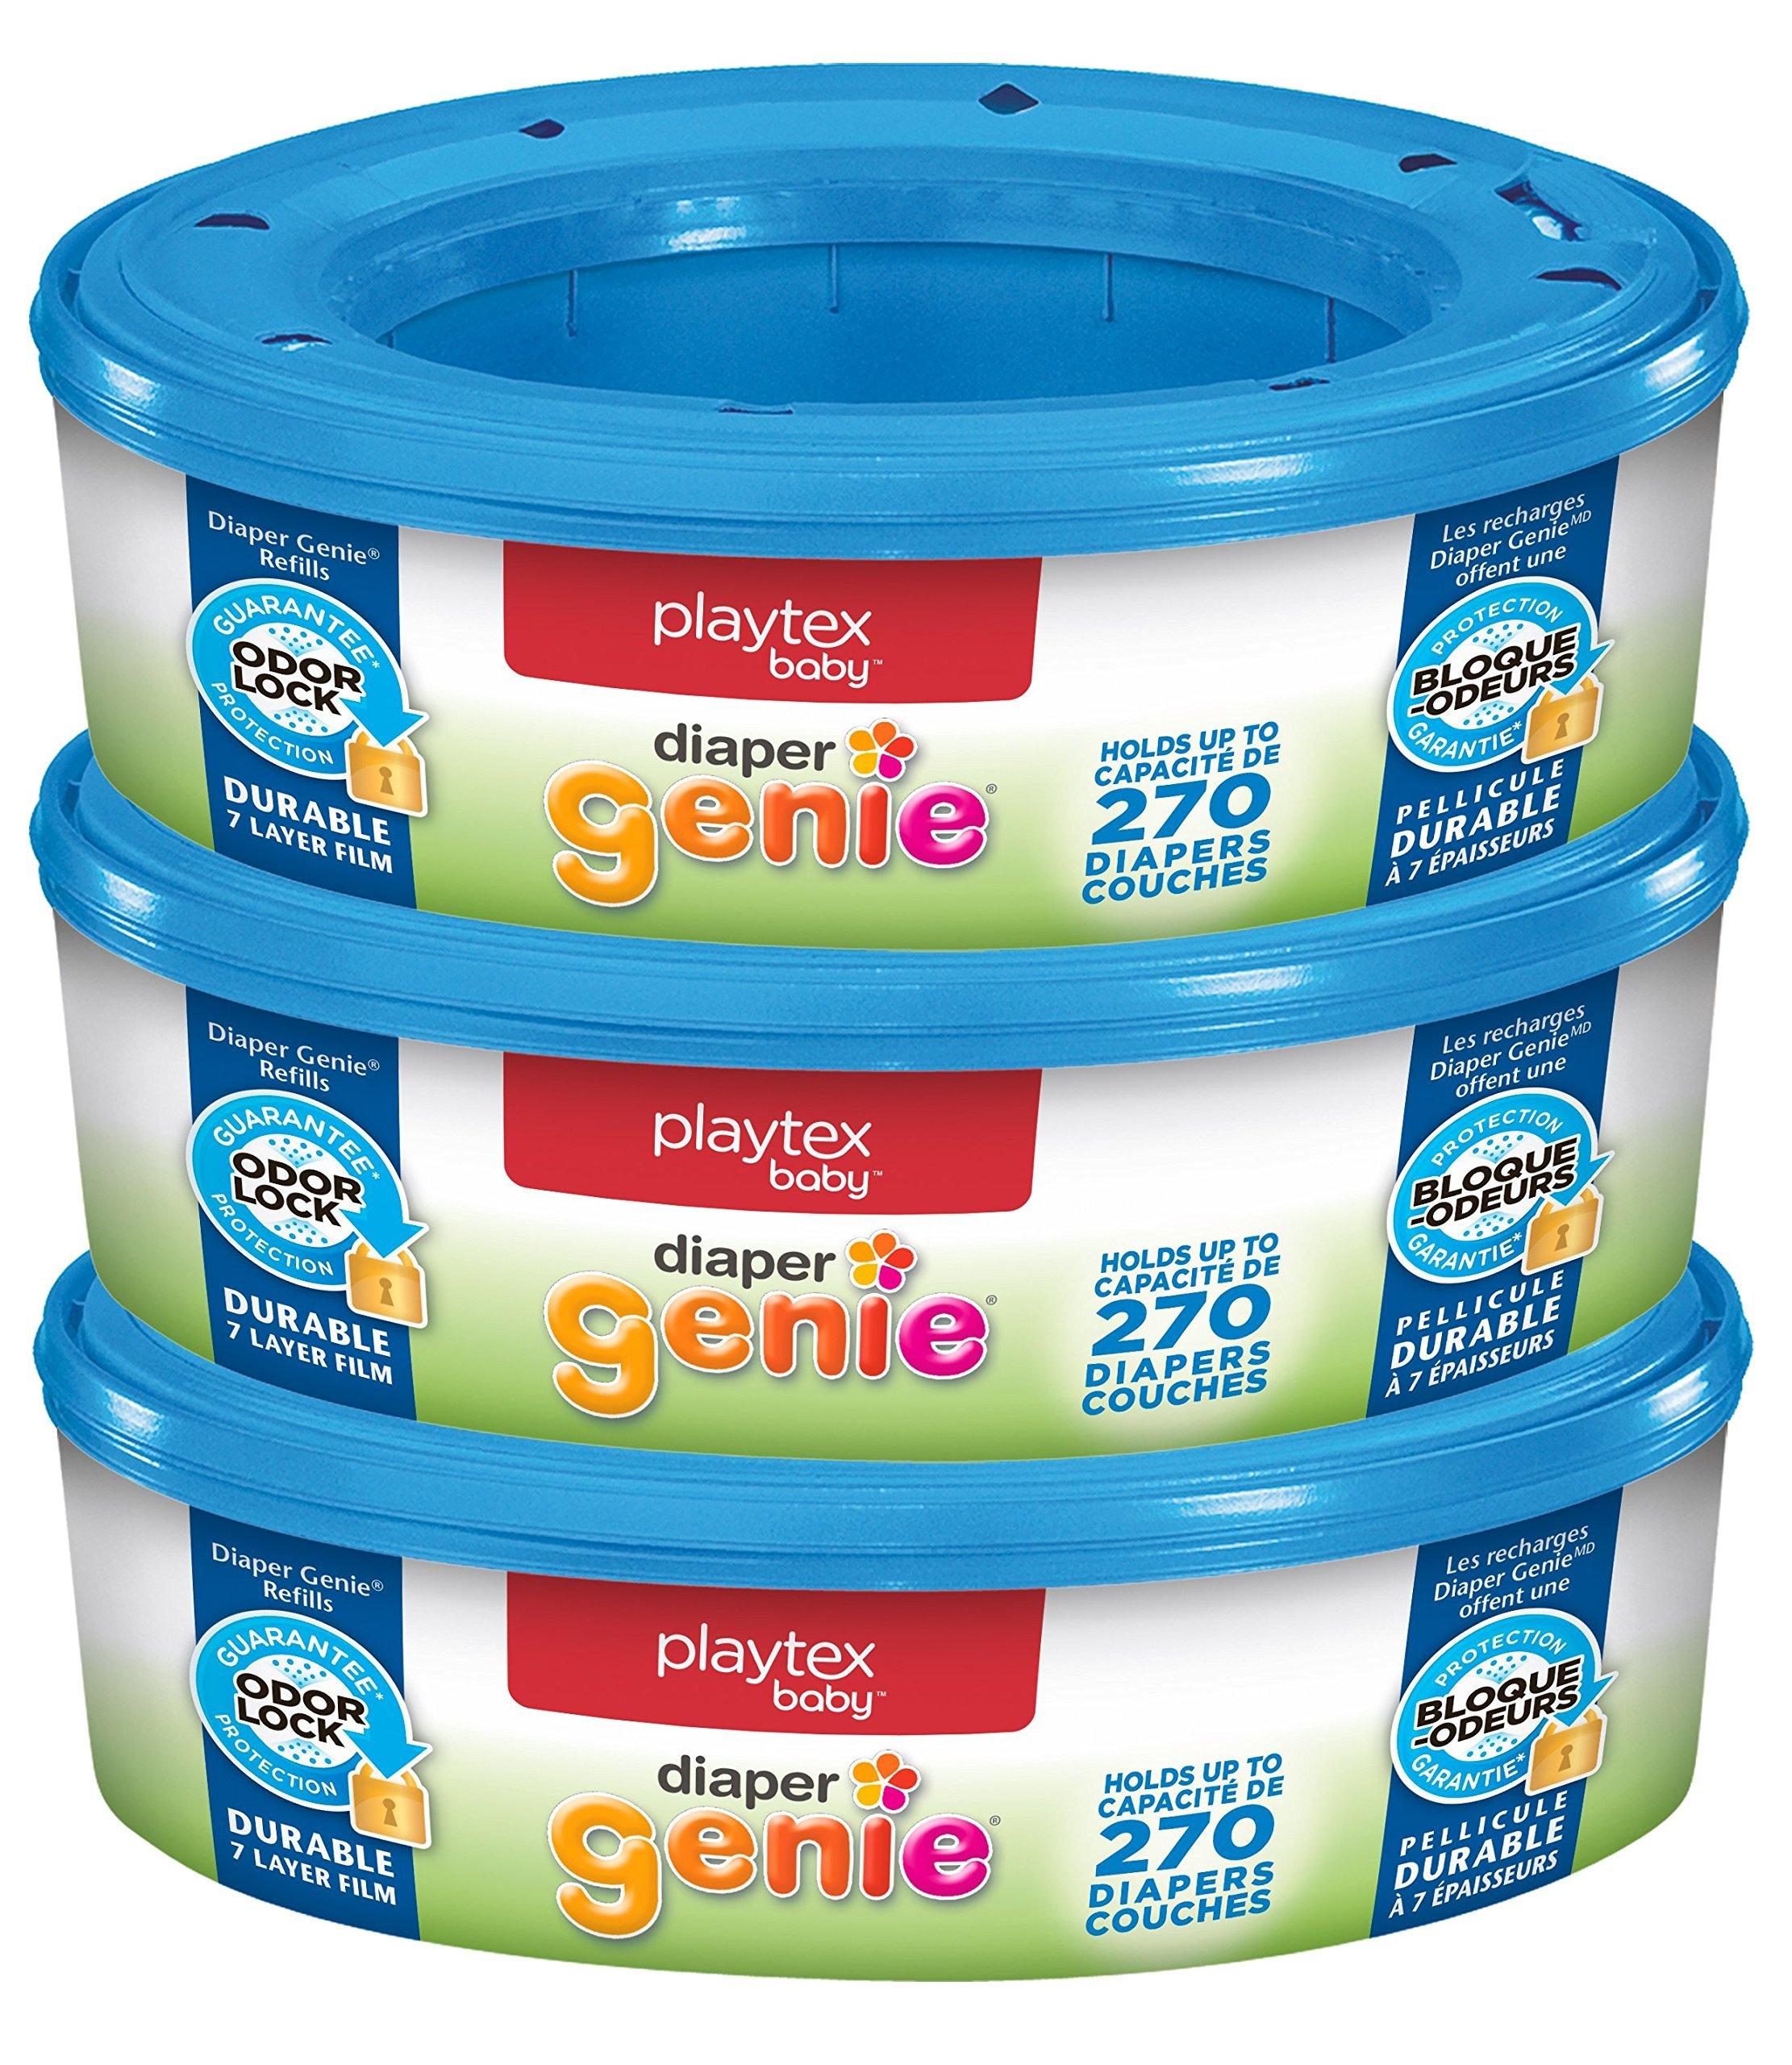 Playtex Diaper Genie Refill Bags, Ideal for Diaper Genie Diaper Pails, Pack of 3, 810 Count by Diaper Genie